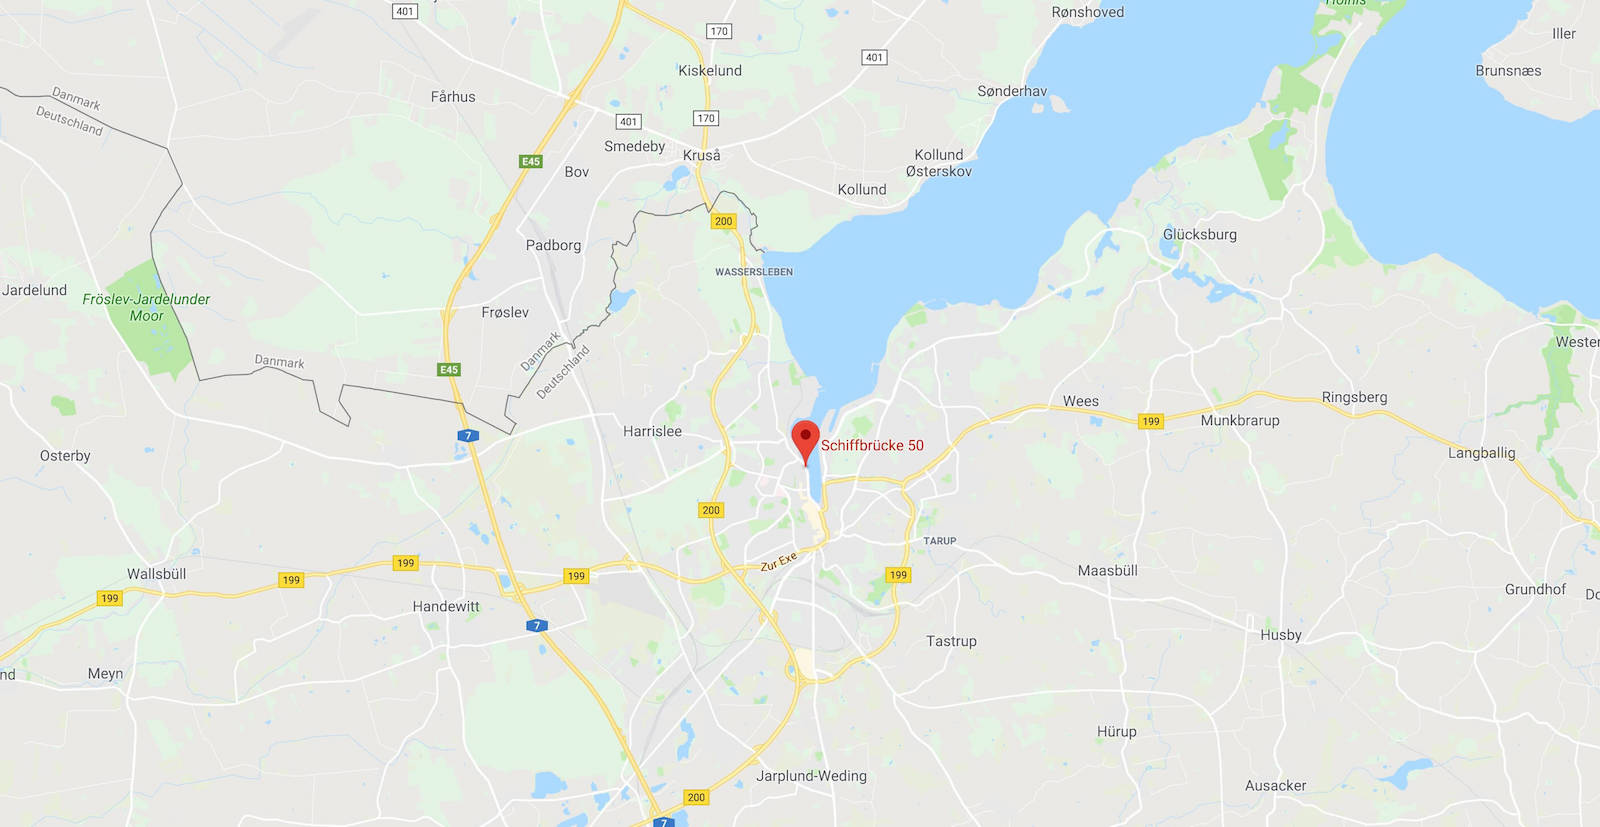 Flensburg Karte.Salsa Kurs In Flensburg Salsaland